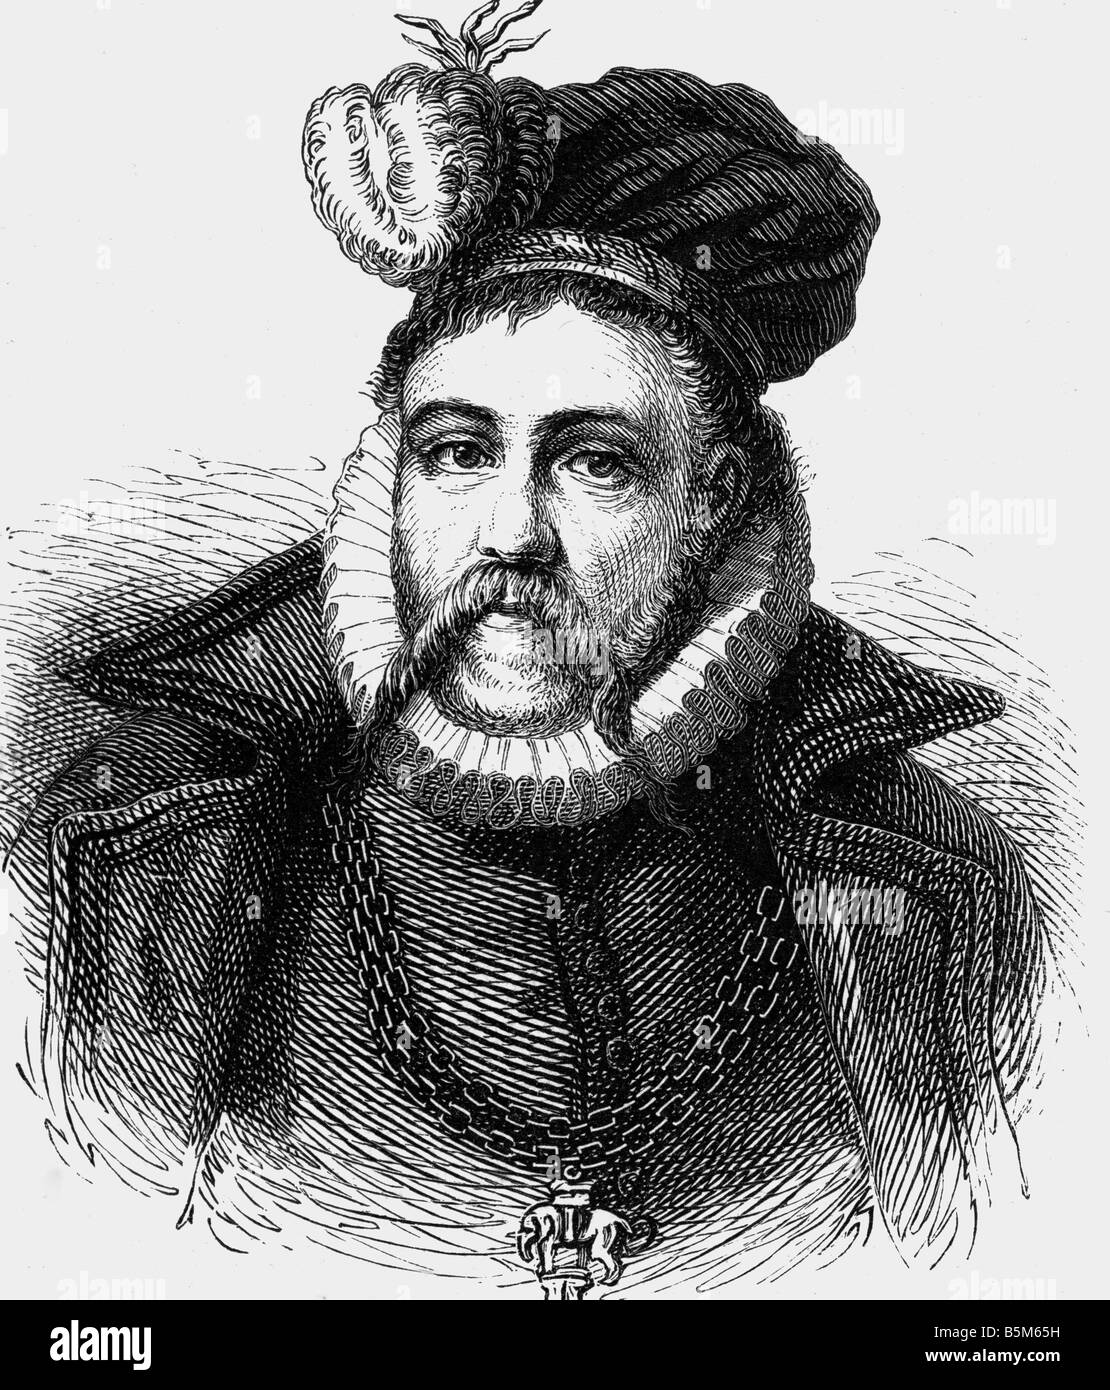 Brahe, Tycho, 14.12.1546 - 24.10.1601, Danish astronomer,    portrait, wood engraving, 19th century, , Additional - Stock Image